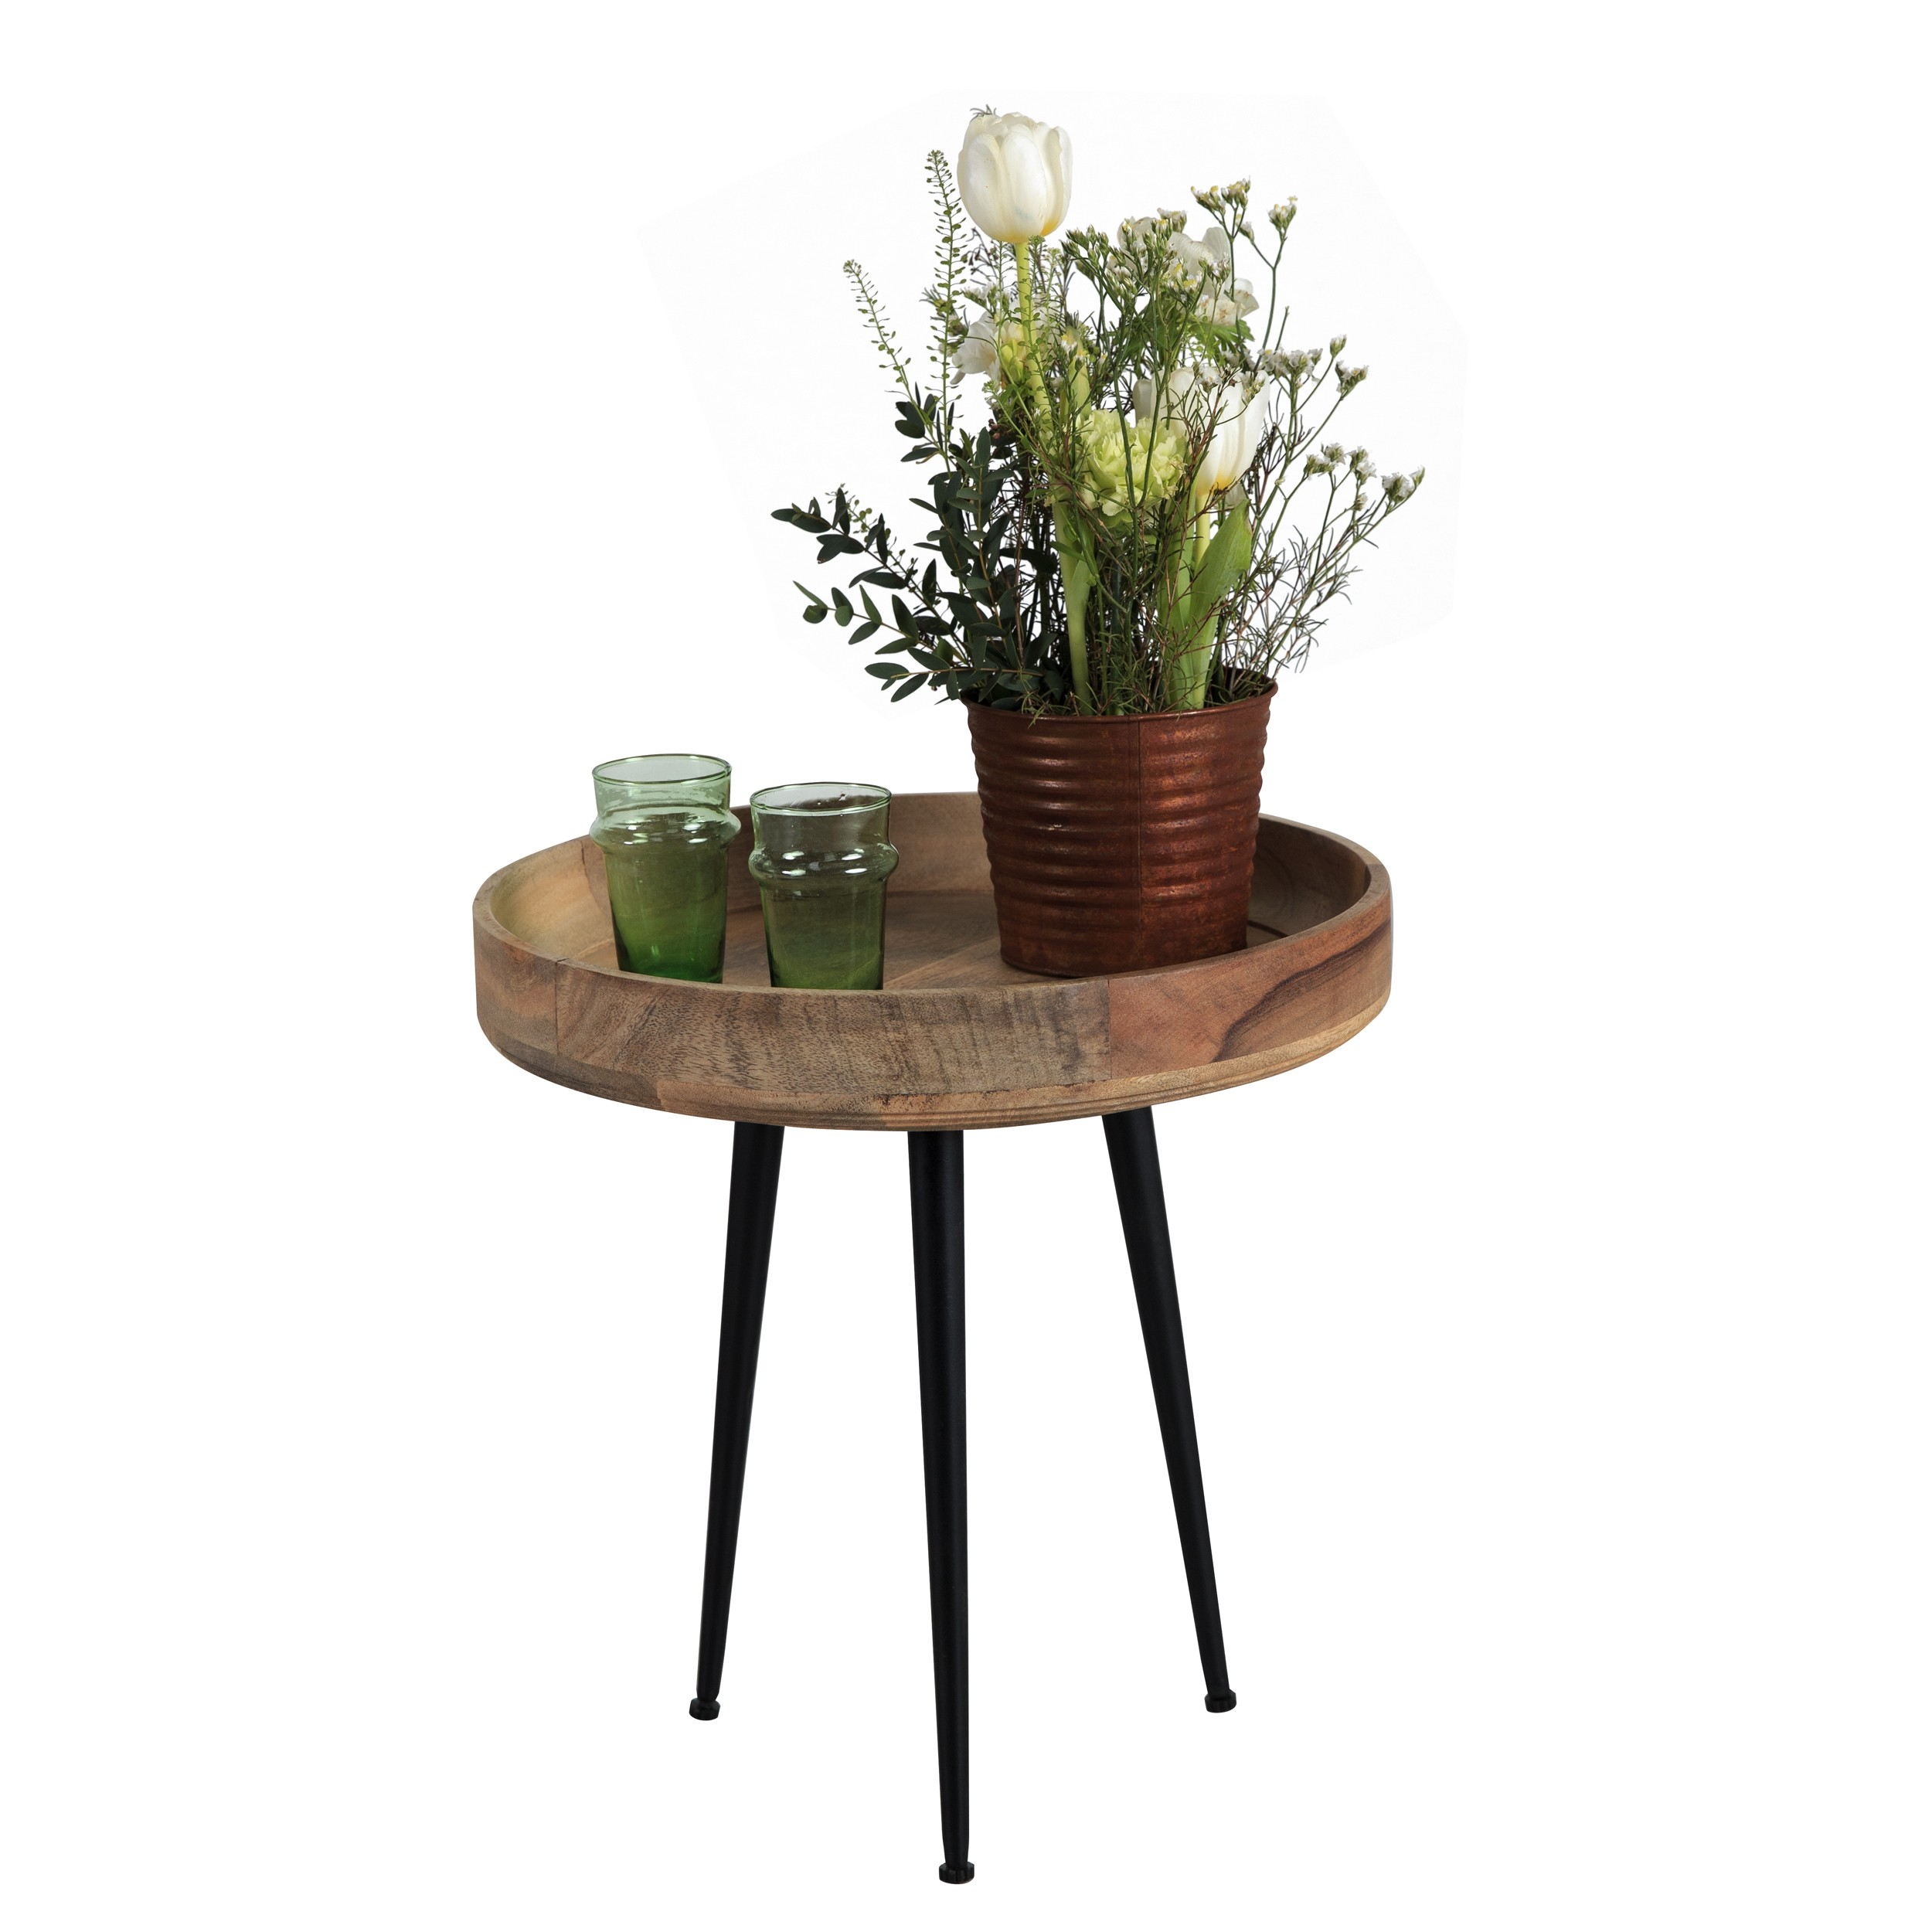 table basse ronde chiba bois clair choisissez les tables. Black Bedroom Furniture Sets. Home Design Ideas